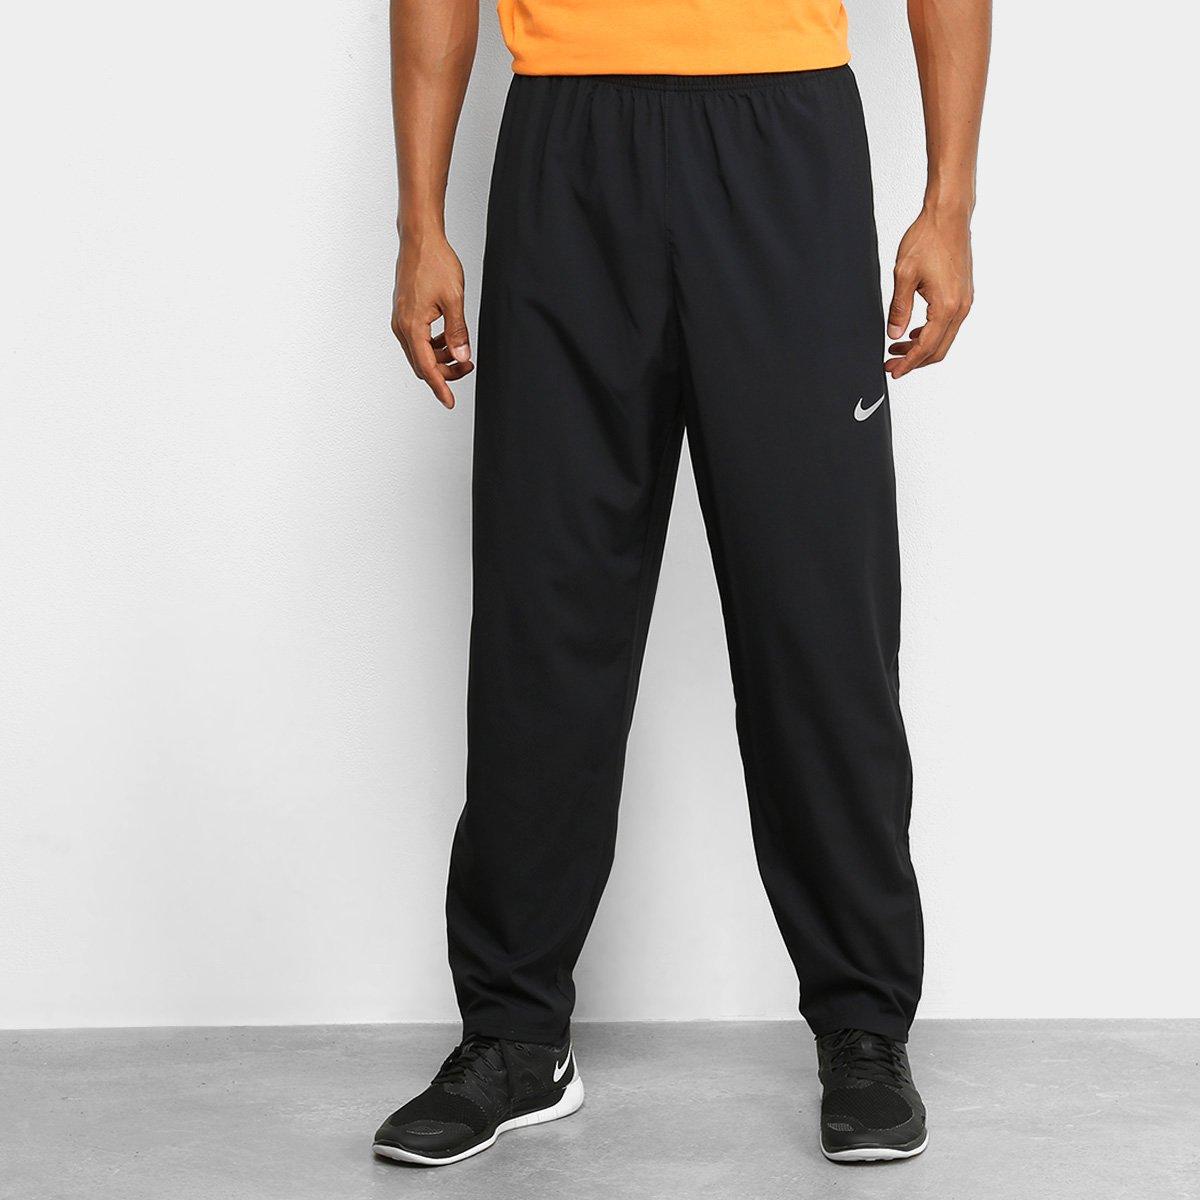 Calça Nike Run Stripe Woven Masculina - Tam: G